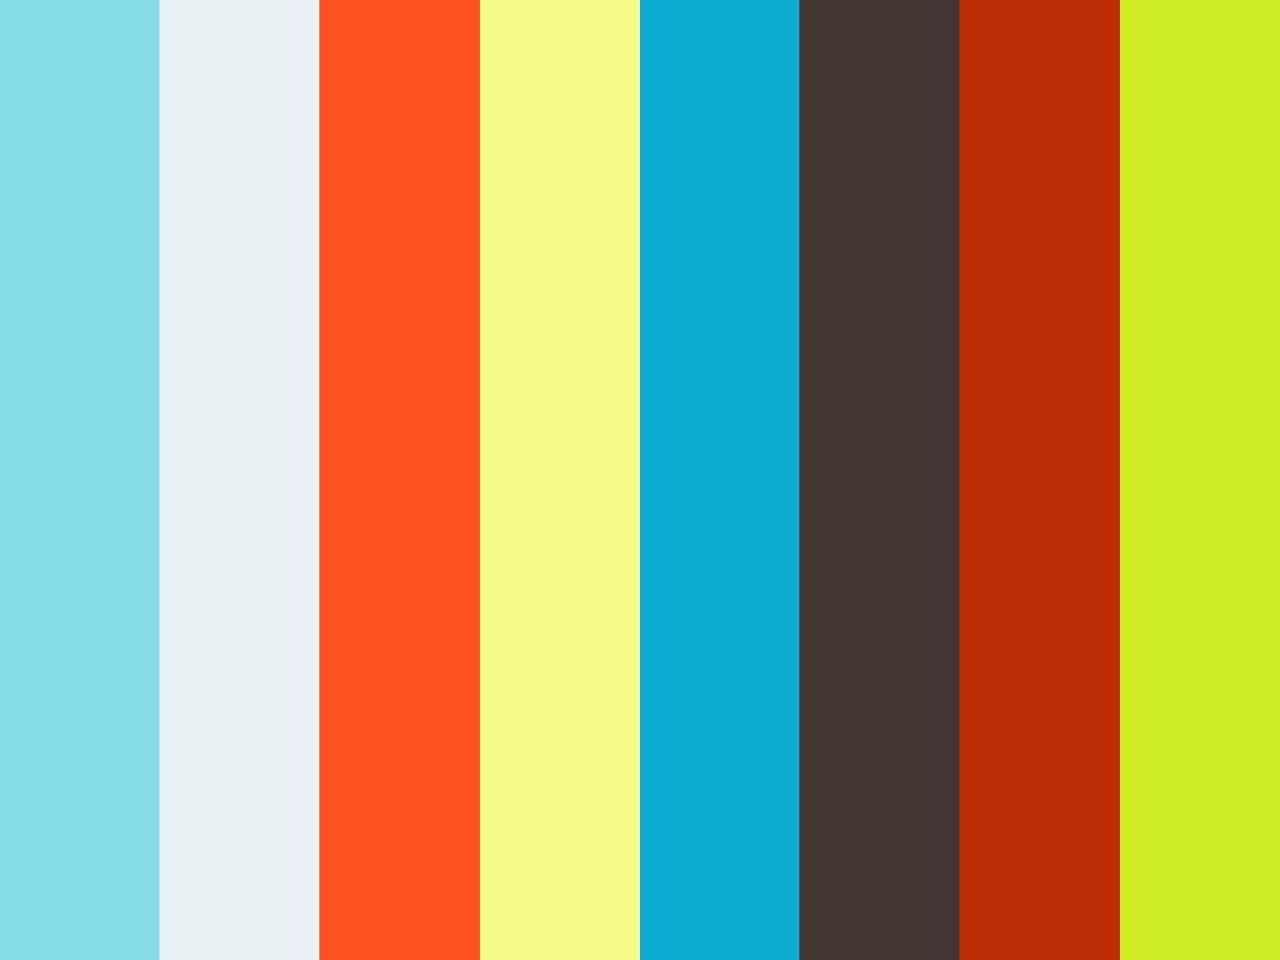 Jeremy Fish - Skin & Bones Dominoes for TOTT Global